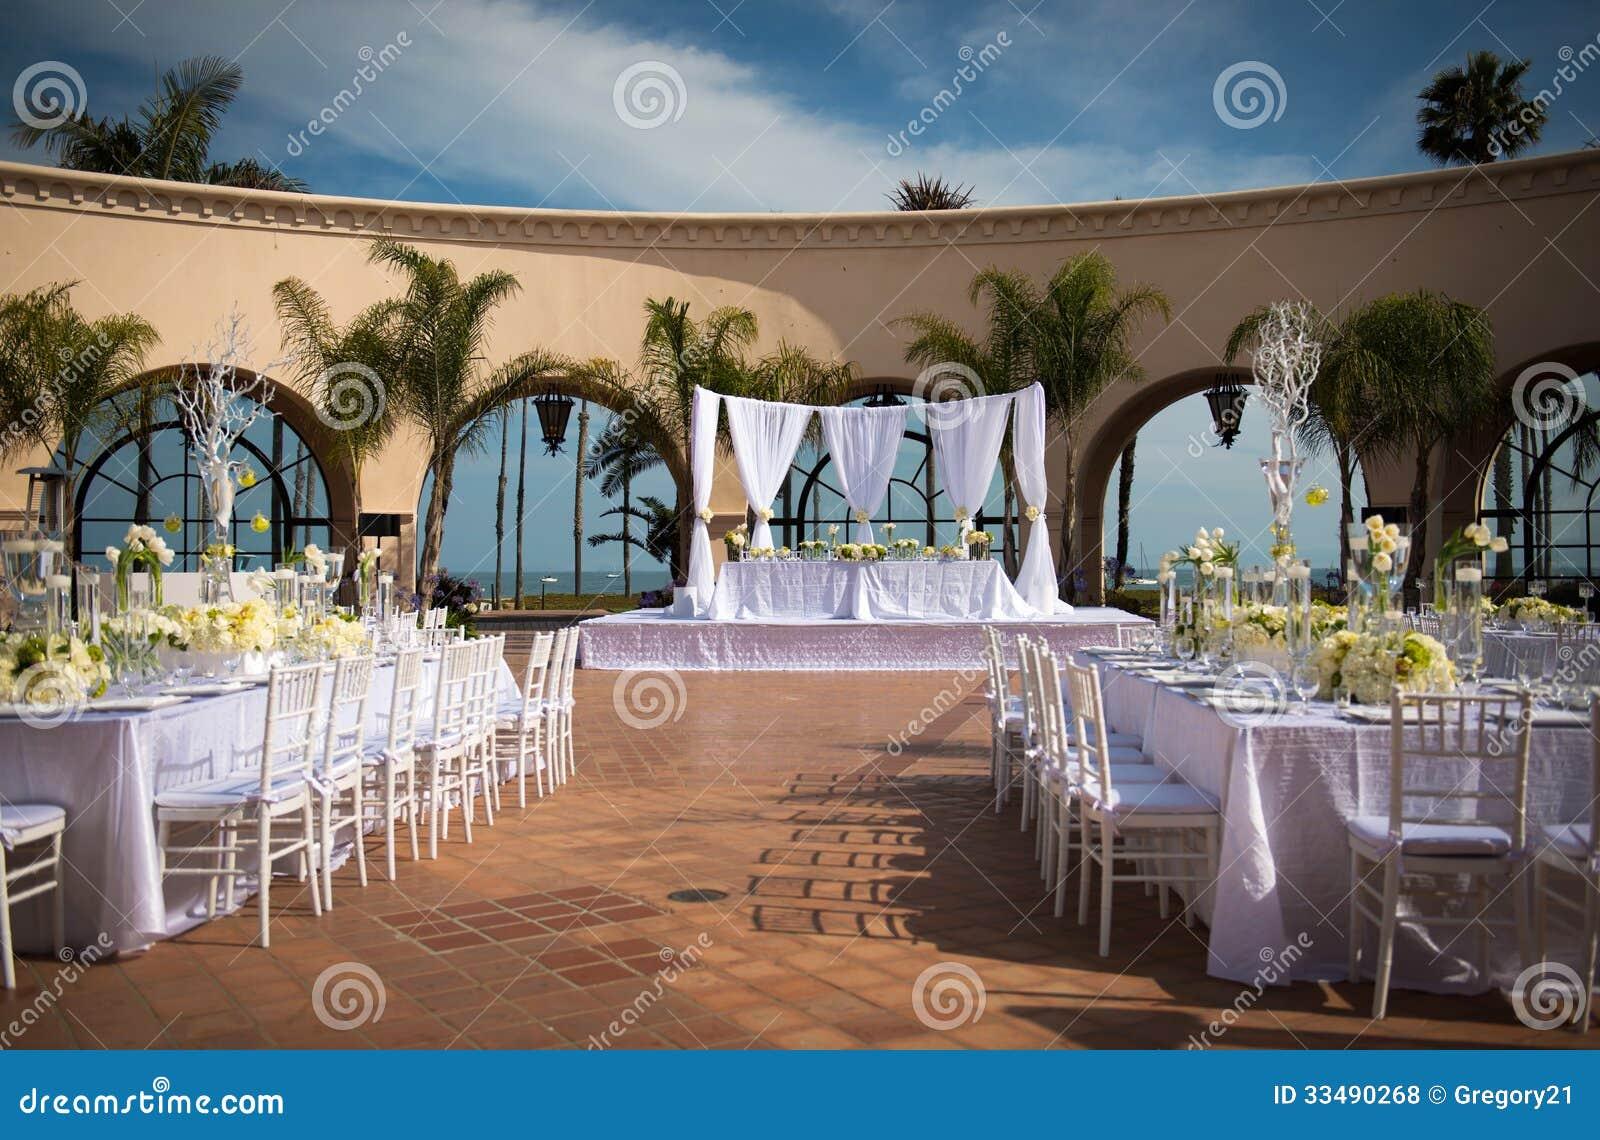 Beautiful Outdoor Wedding Venue Stock Photo - Image of ...